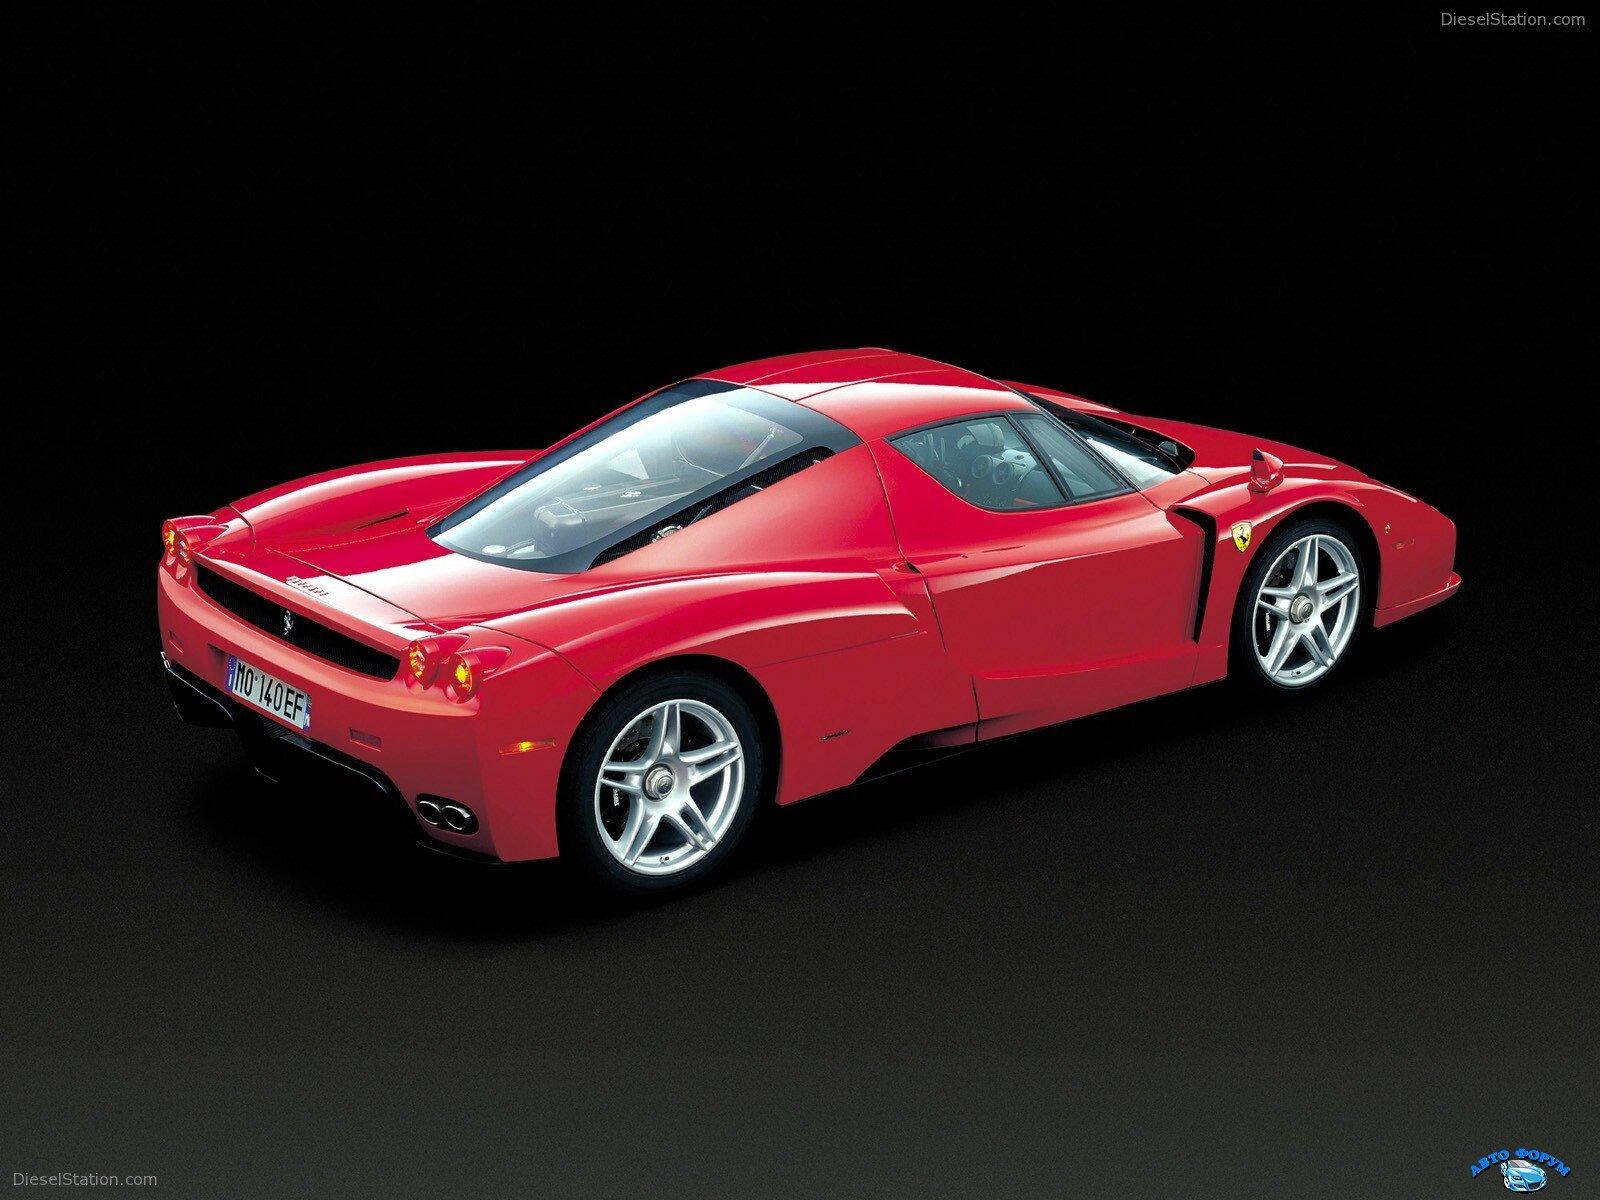 Ferrari-Enzo-002.jpg